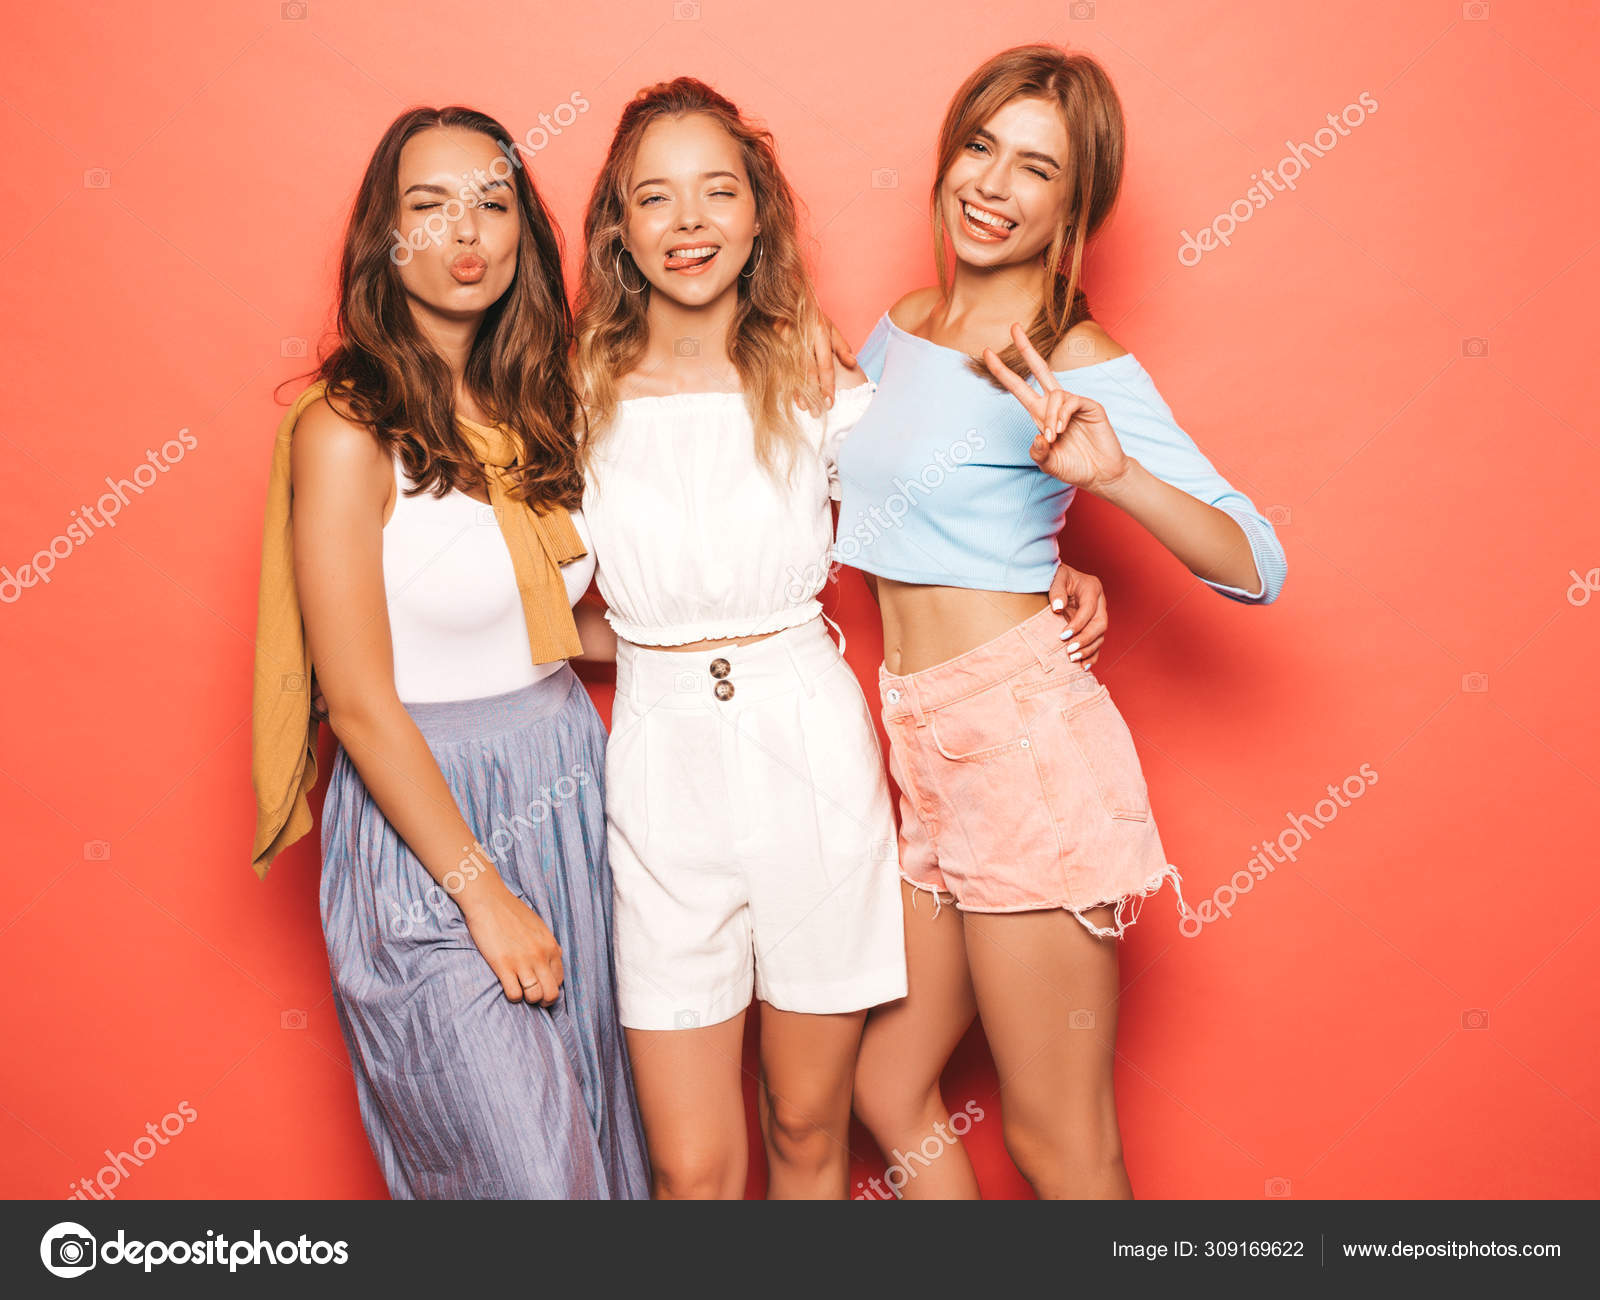 Studio young crazy models girls